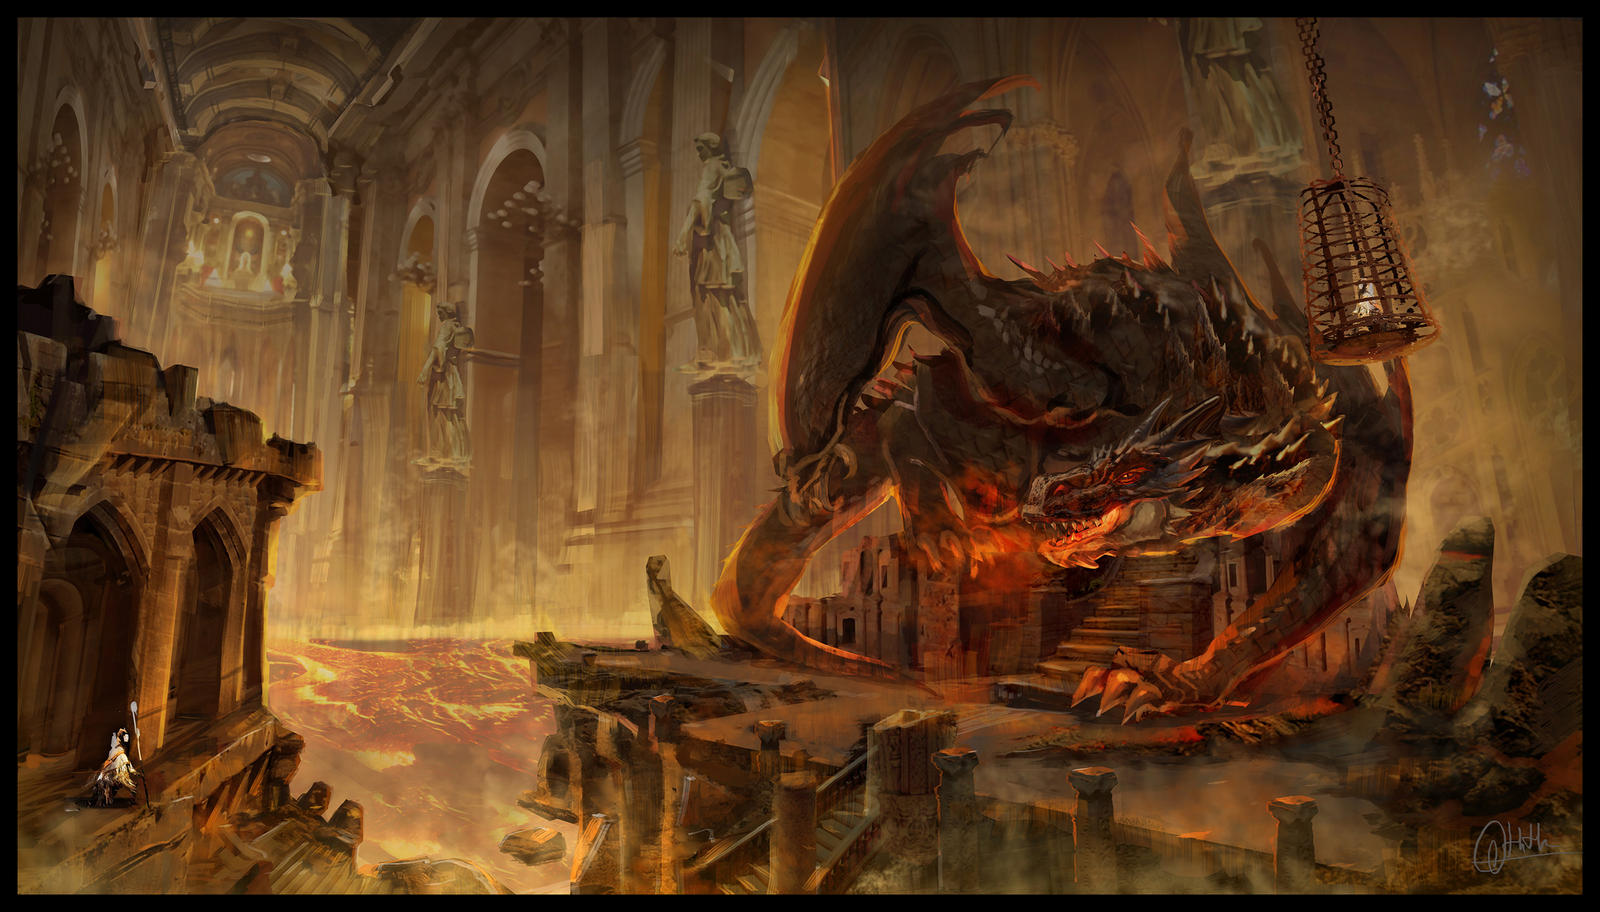 Tha dragon by dothaithanh